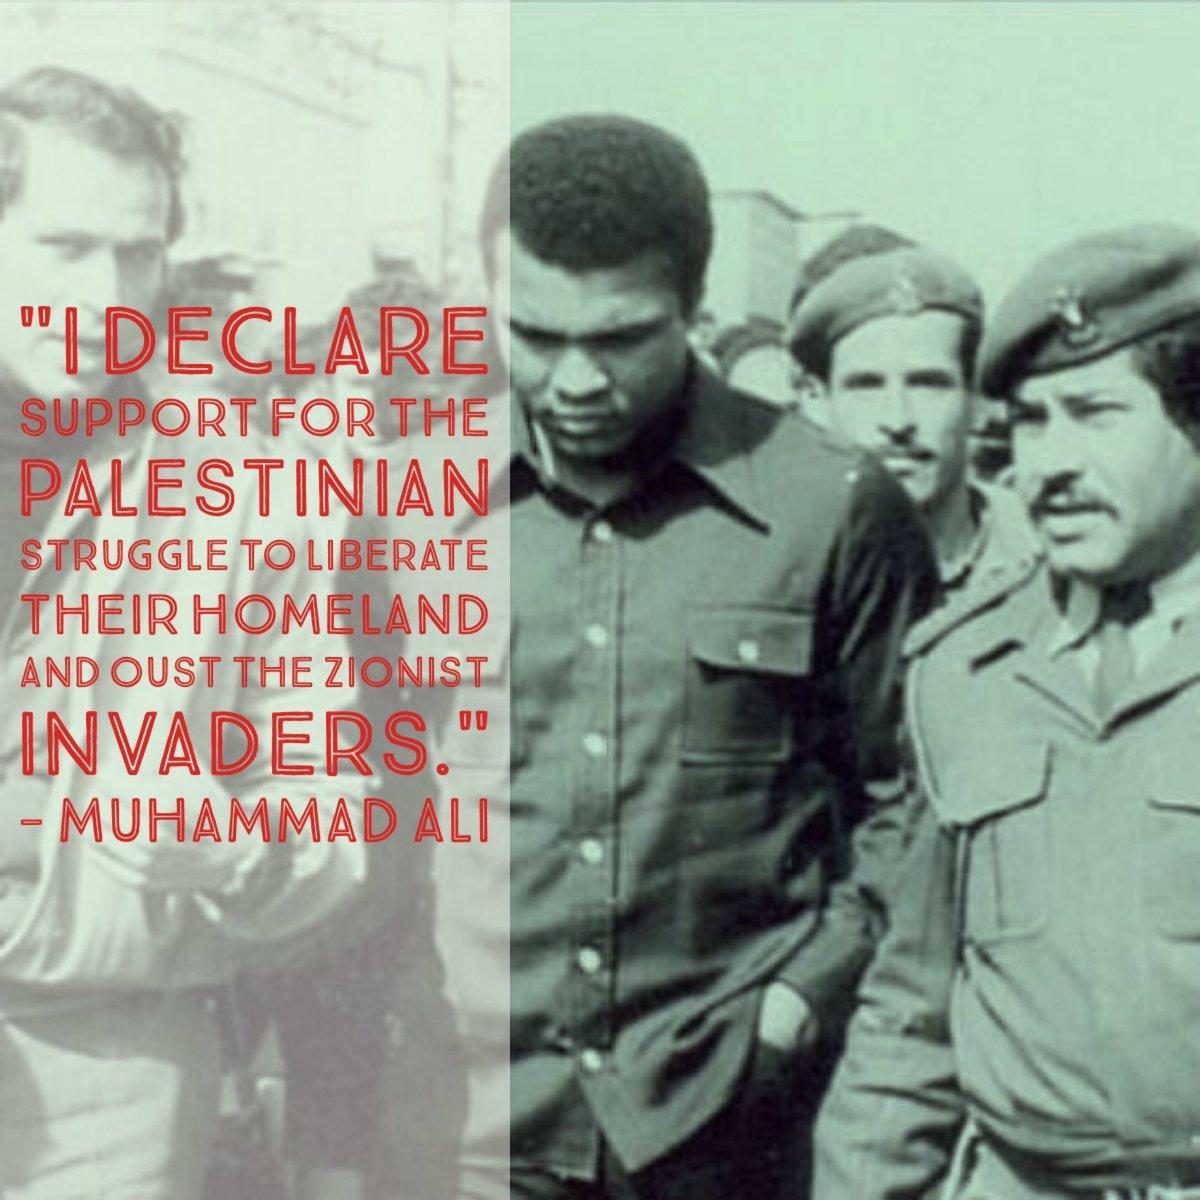 #MuhammadAli during a visit to a Palestinian #refugee camp in Lebanon 1974. #RIPMuhammadAli #TheGreatest  #محمد_علي https://t.co/MvG3DOiGIt